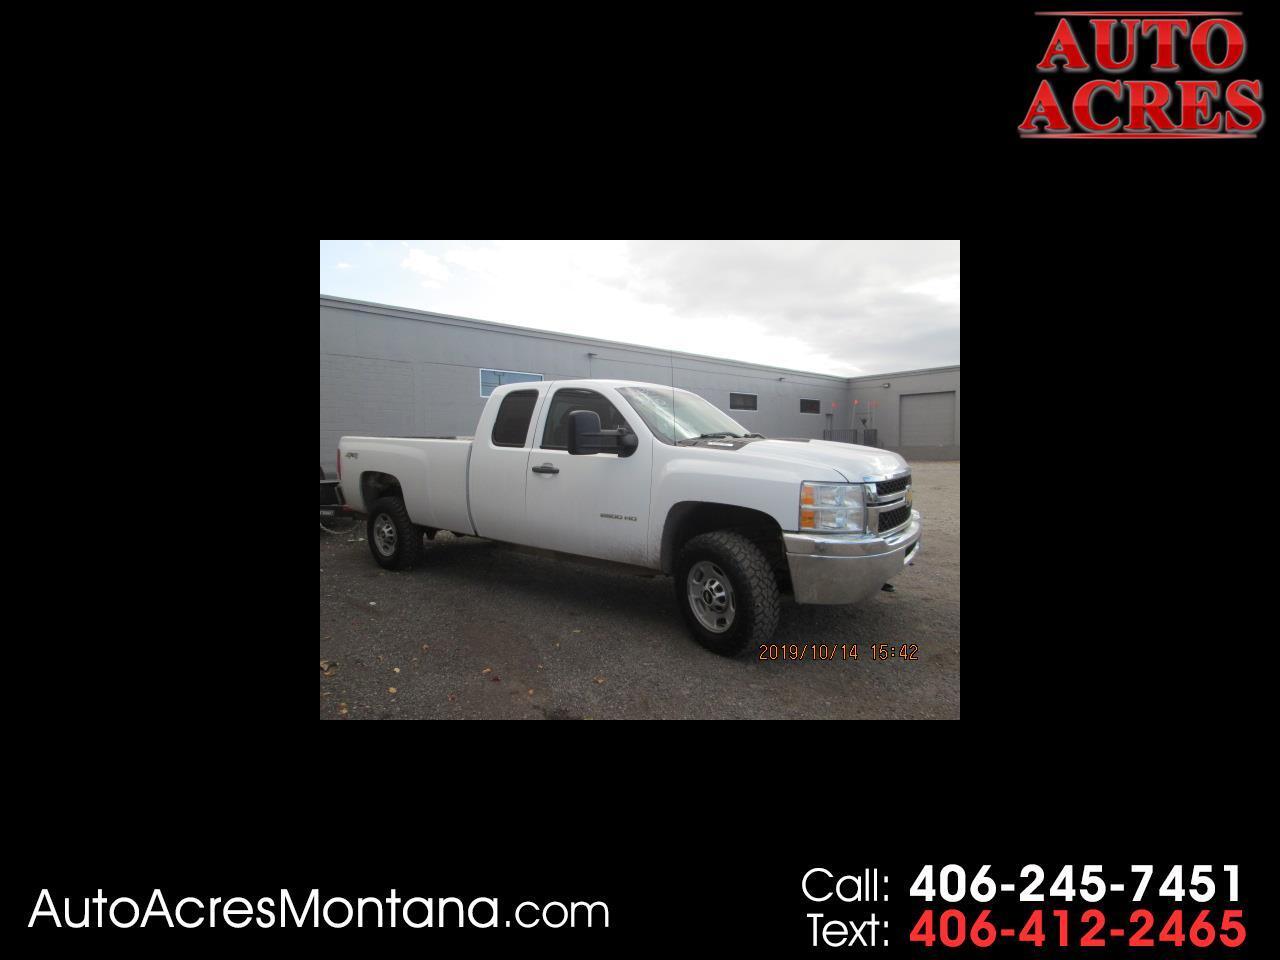 "Chevrolet Silverado 2500HD 4WD Ext Cab 158.2"" Work Truck 2012"